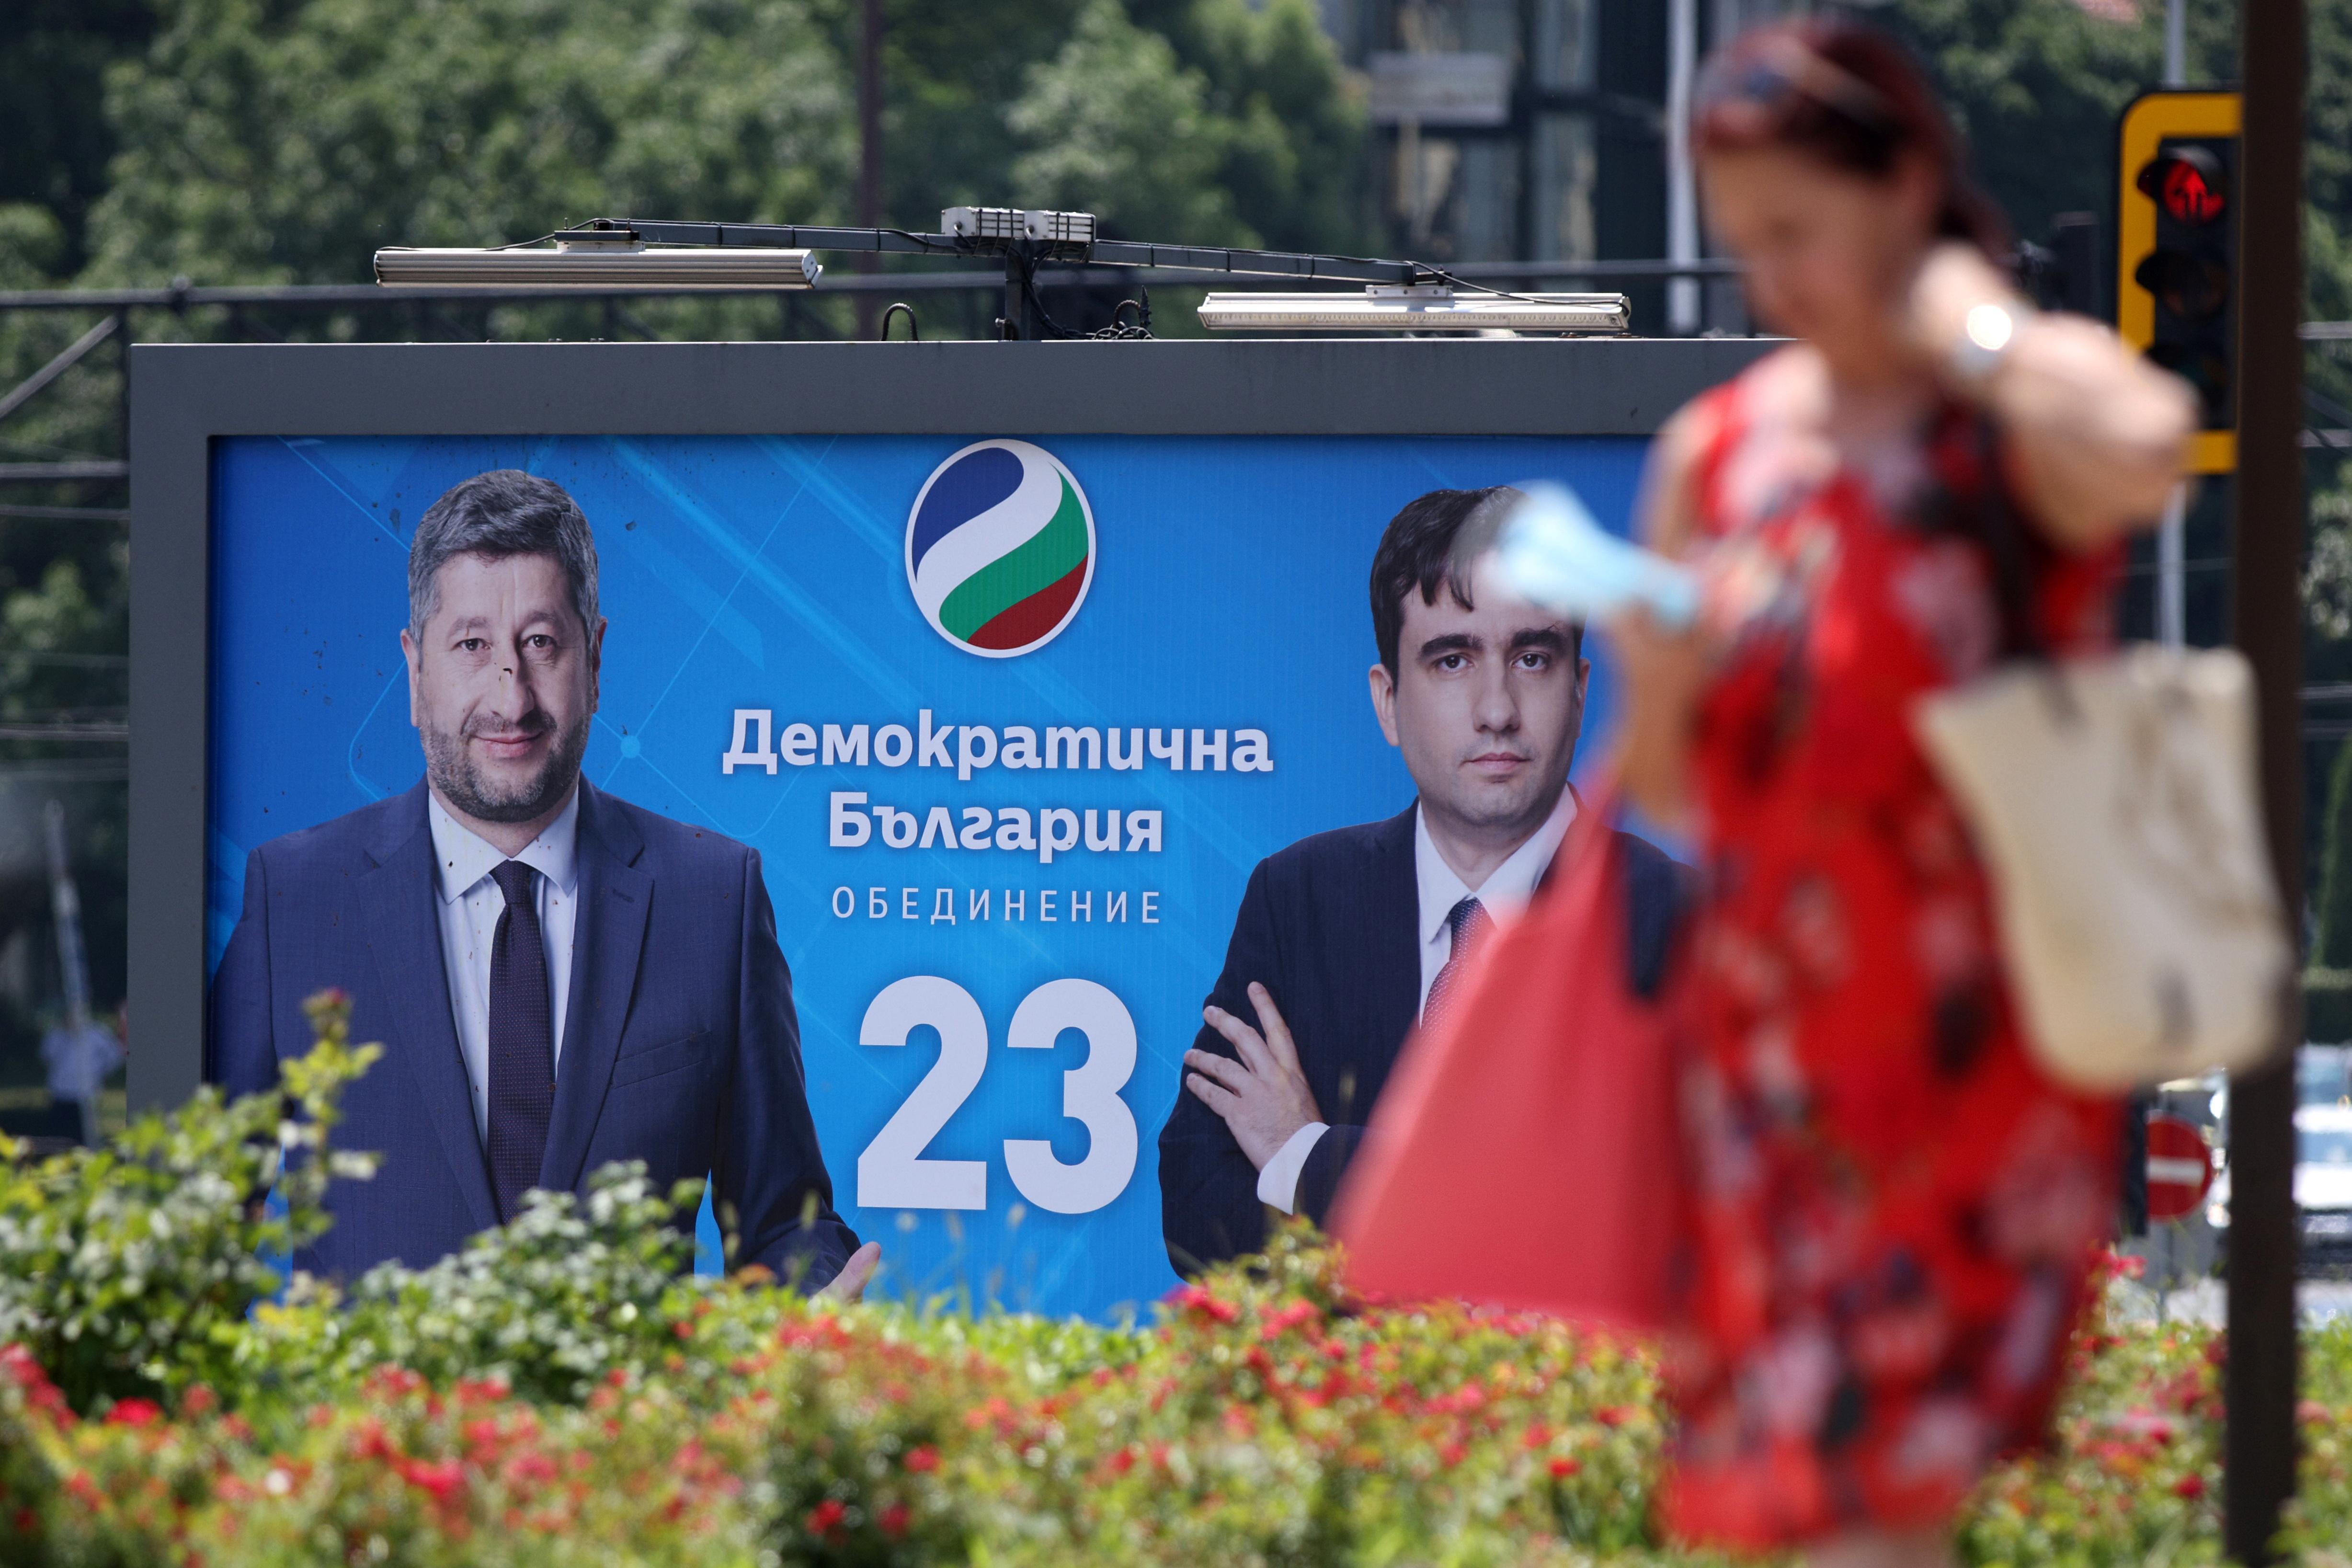 A woman walks past election billboard of Democratic Bulgaria party in Sofia, Bulgaria, July 8, 2021.  REUTERS/Stoyan Nenov